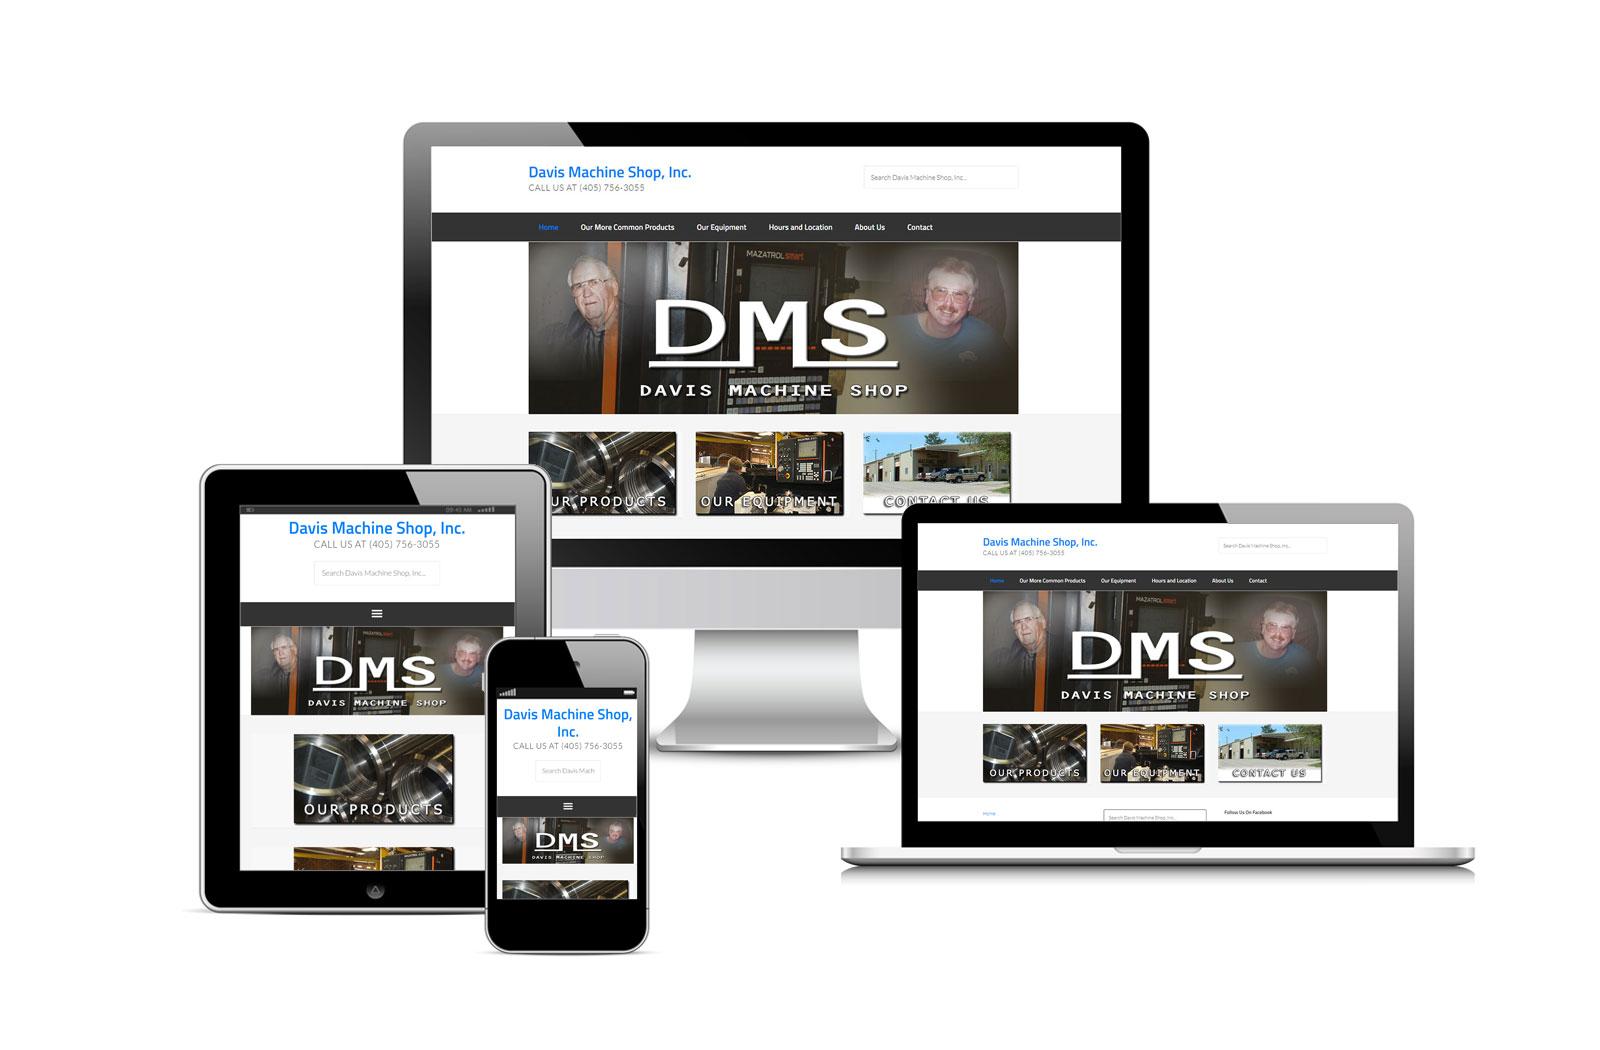 Davis Machine Shop Site Designed by Striped Ape Digital Media